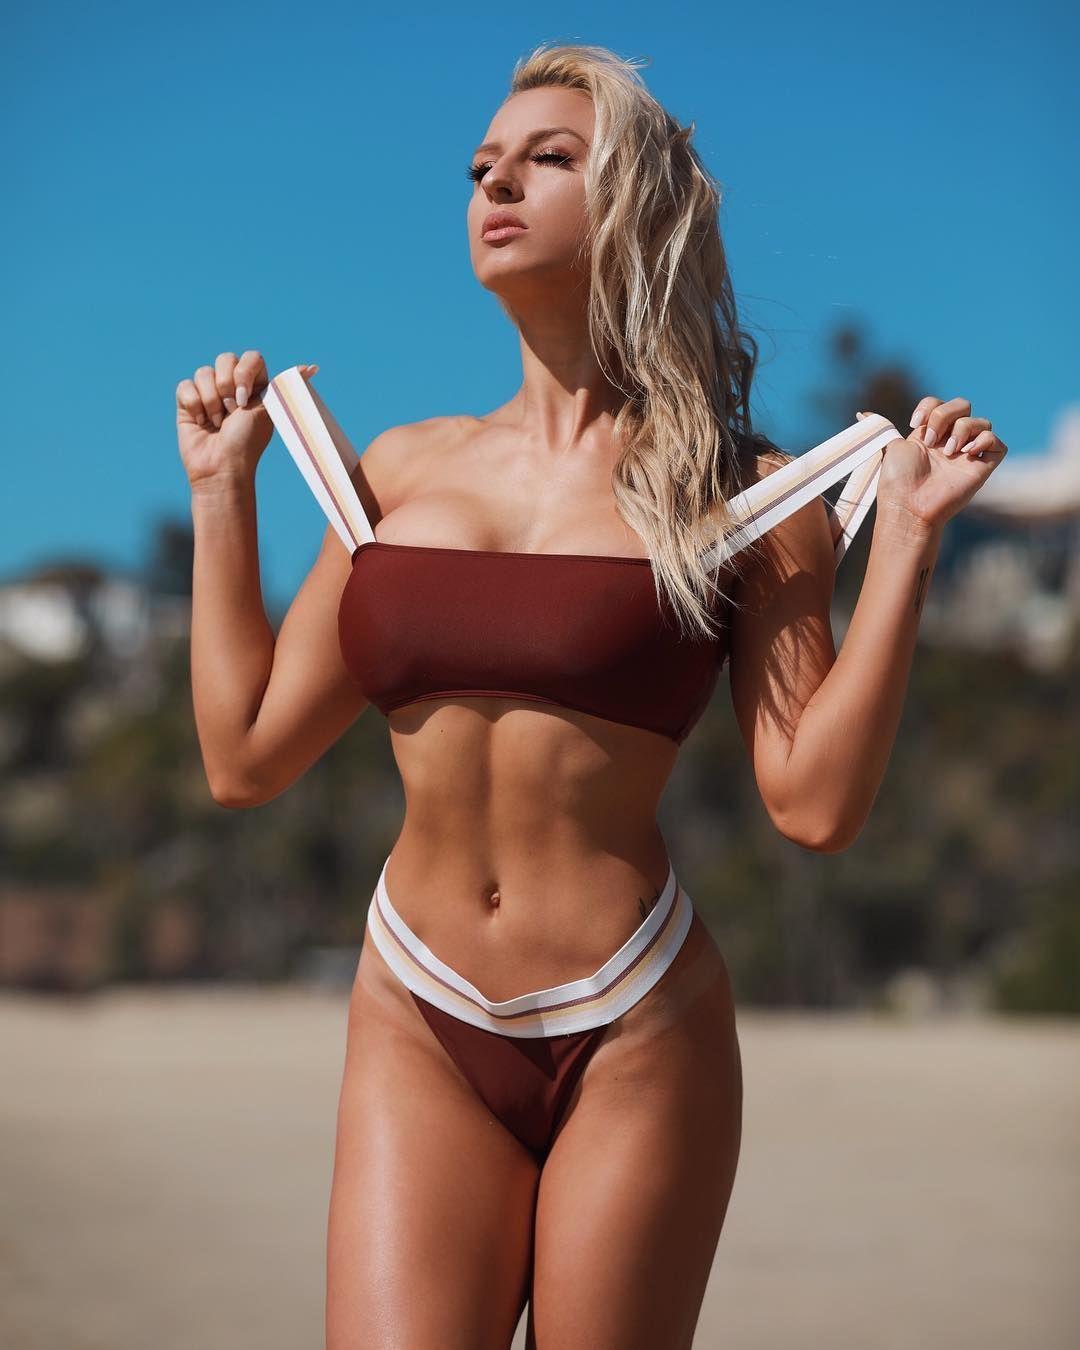 Photos Marta Mielczarska nude (97 photo), Tits, Bikini, Selfie, bra 2020